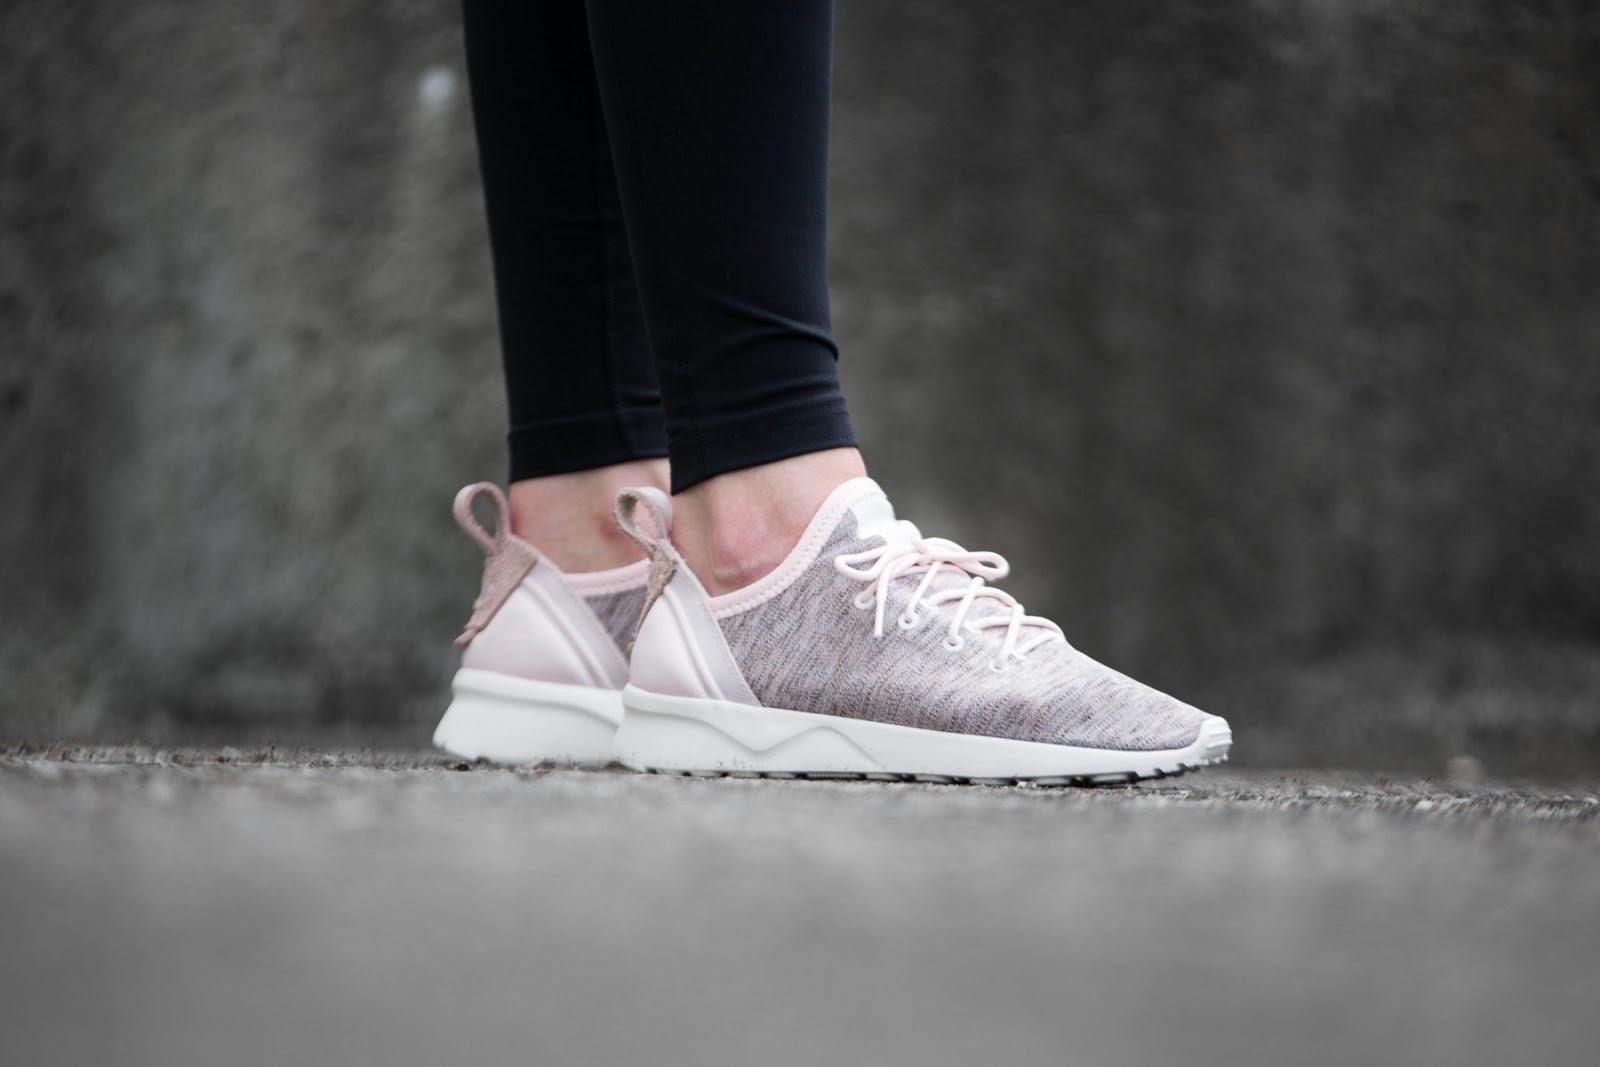 9a6e07bec2010 Adidas. Adidas Originals zx Flux adv Virtue Sock w